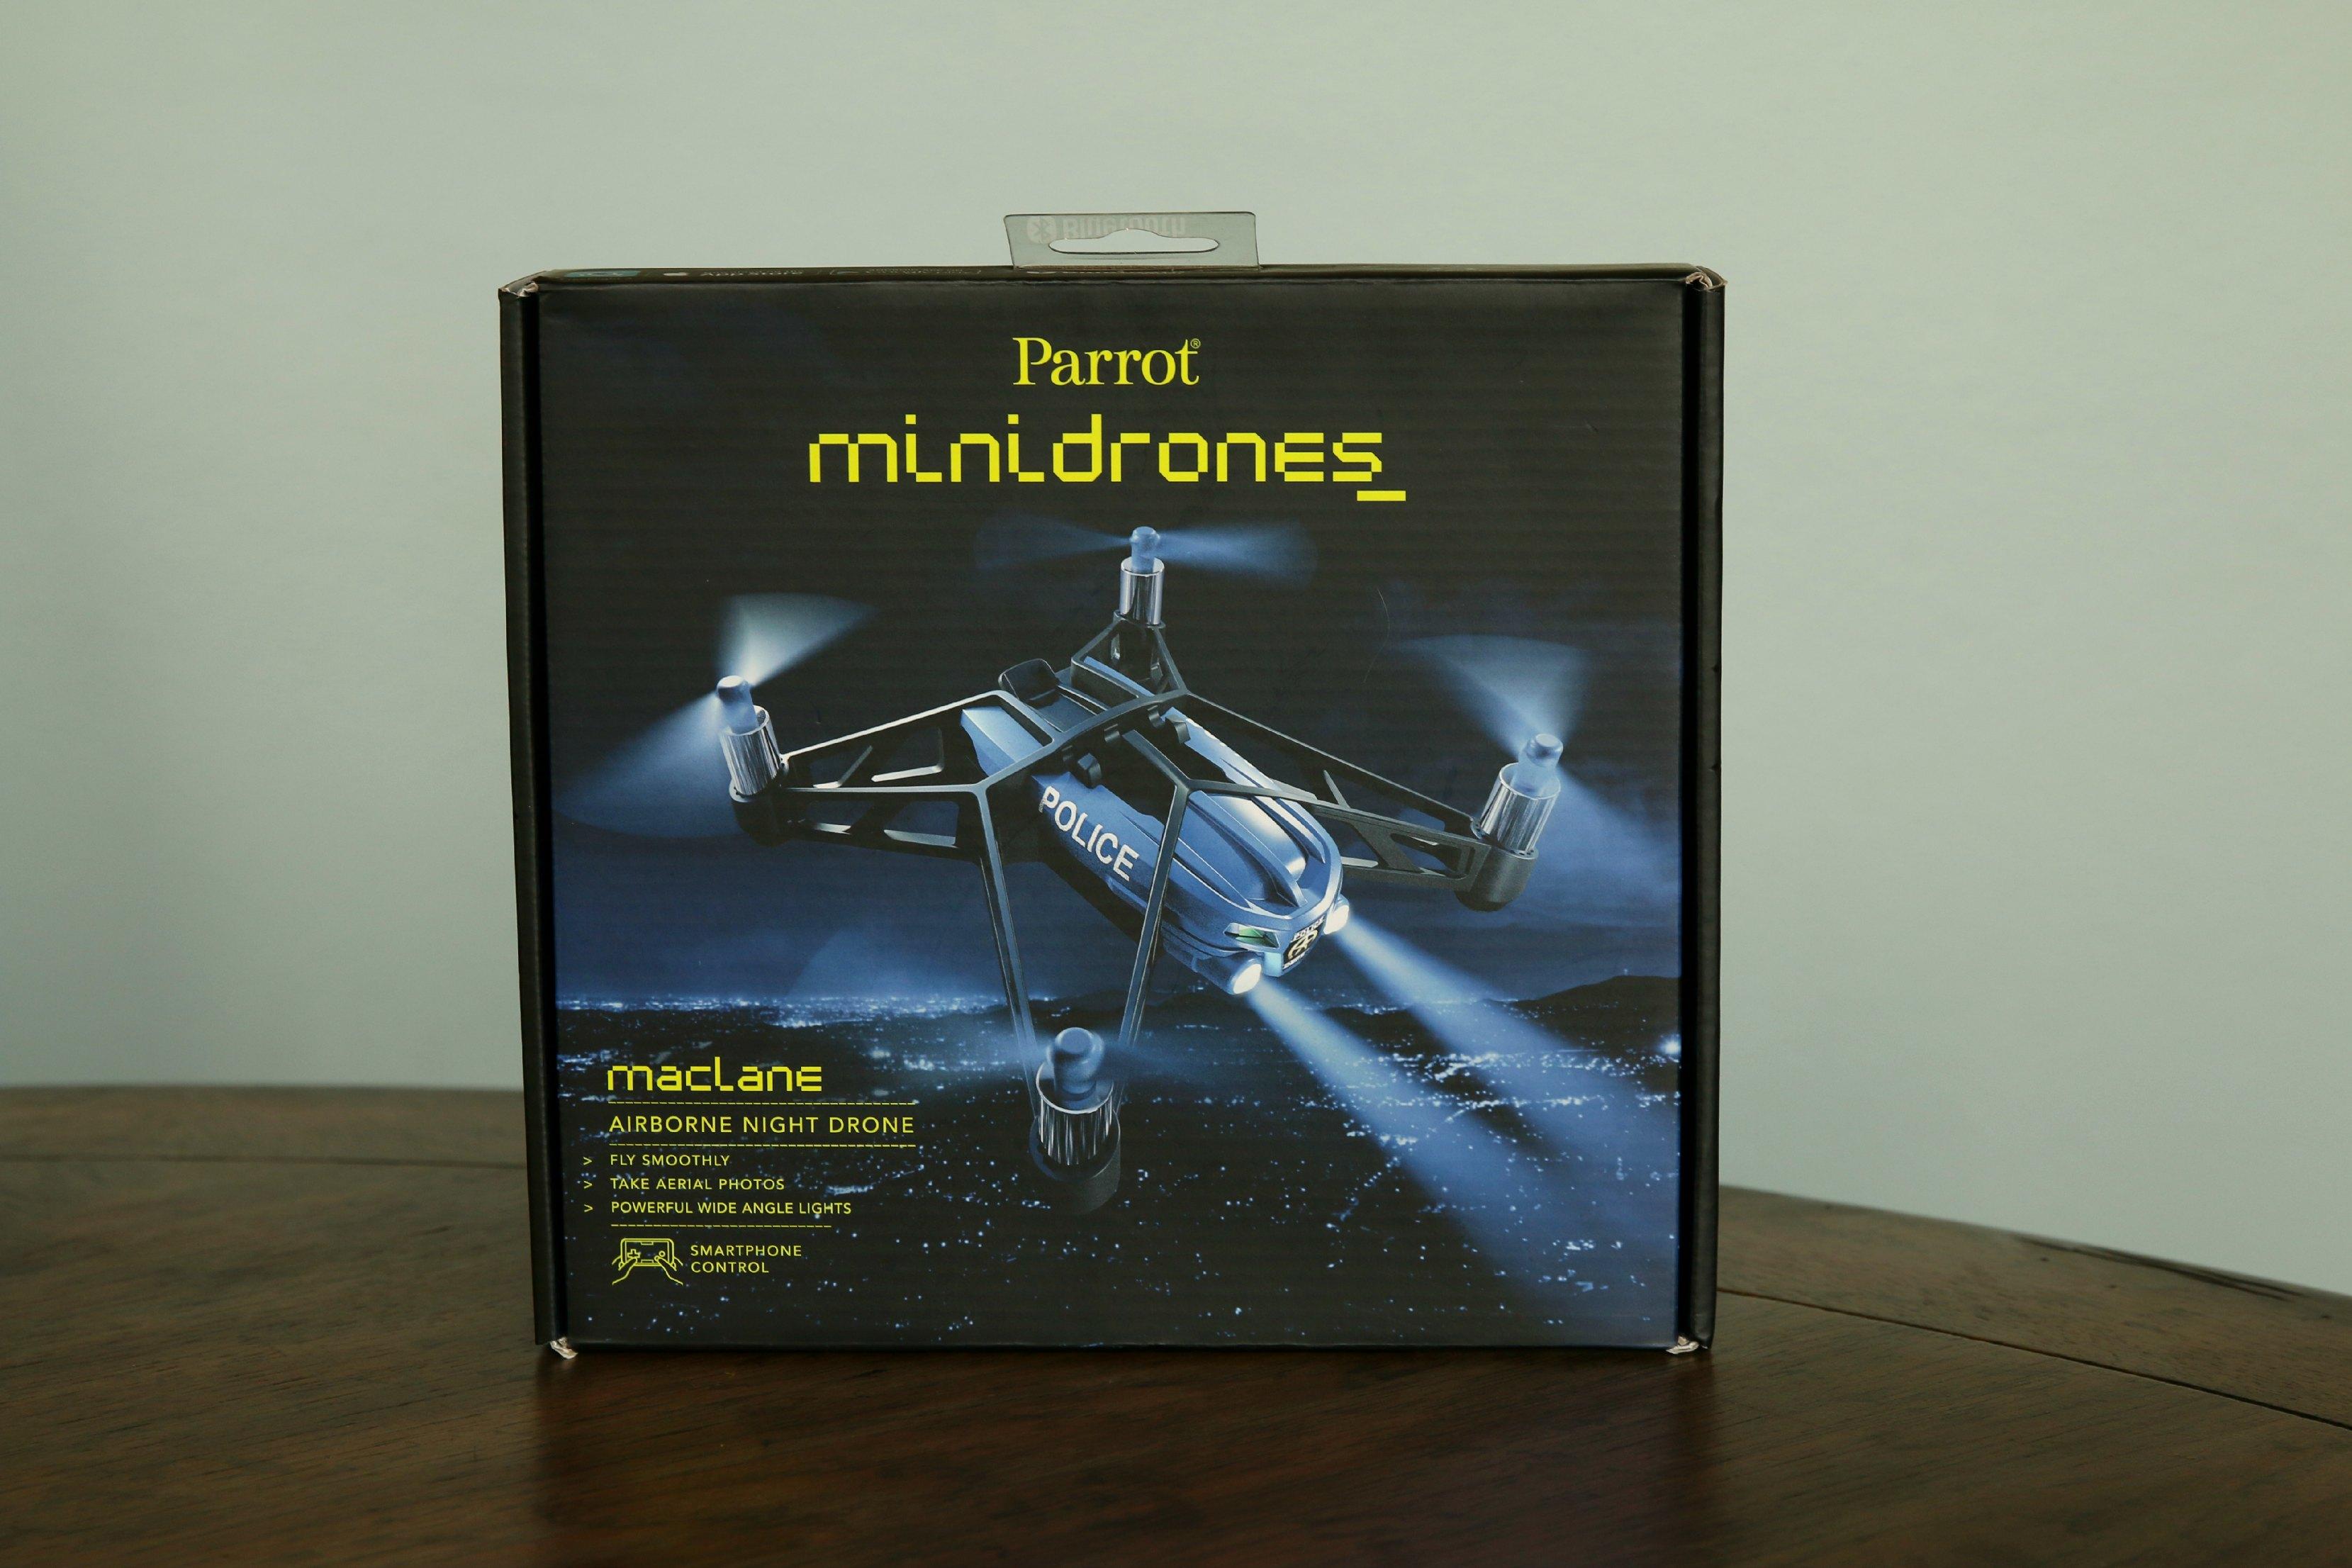 parrot minidrones